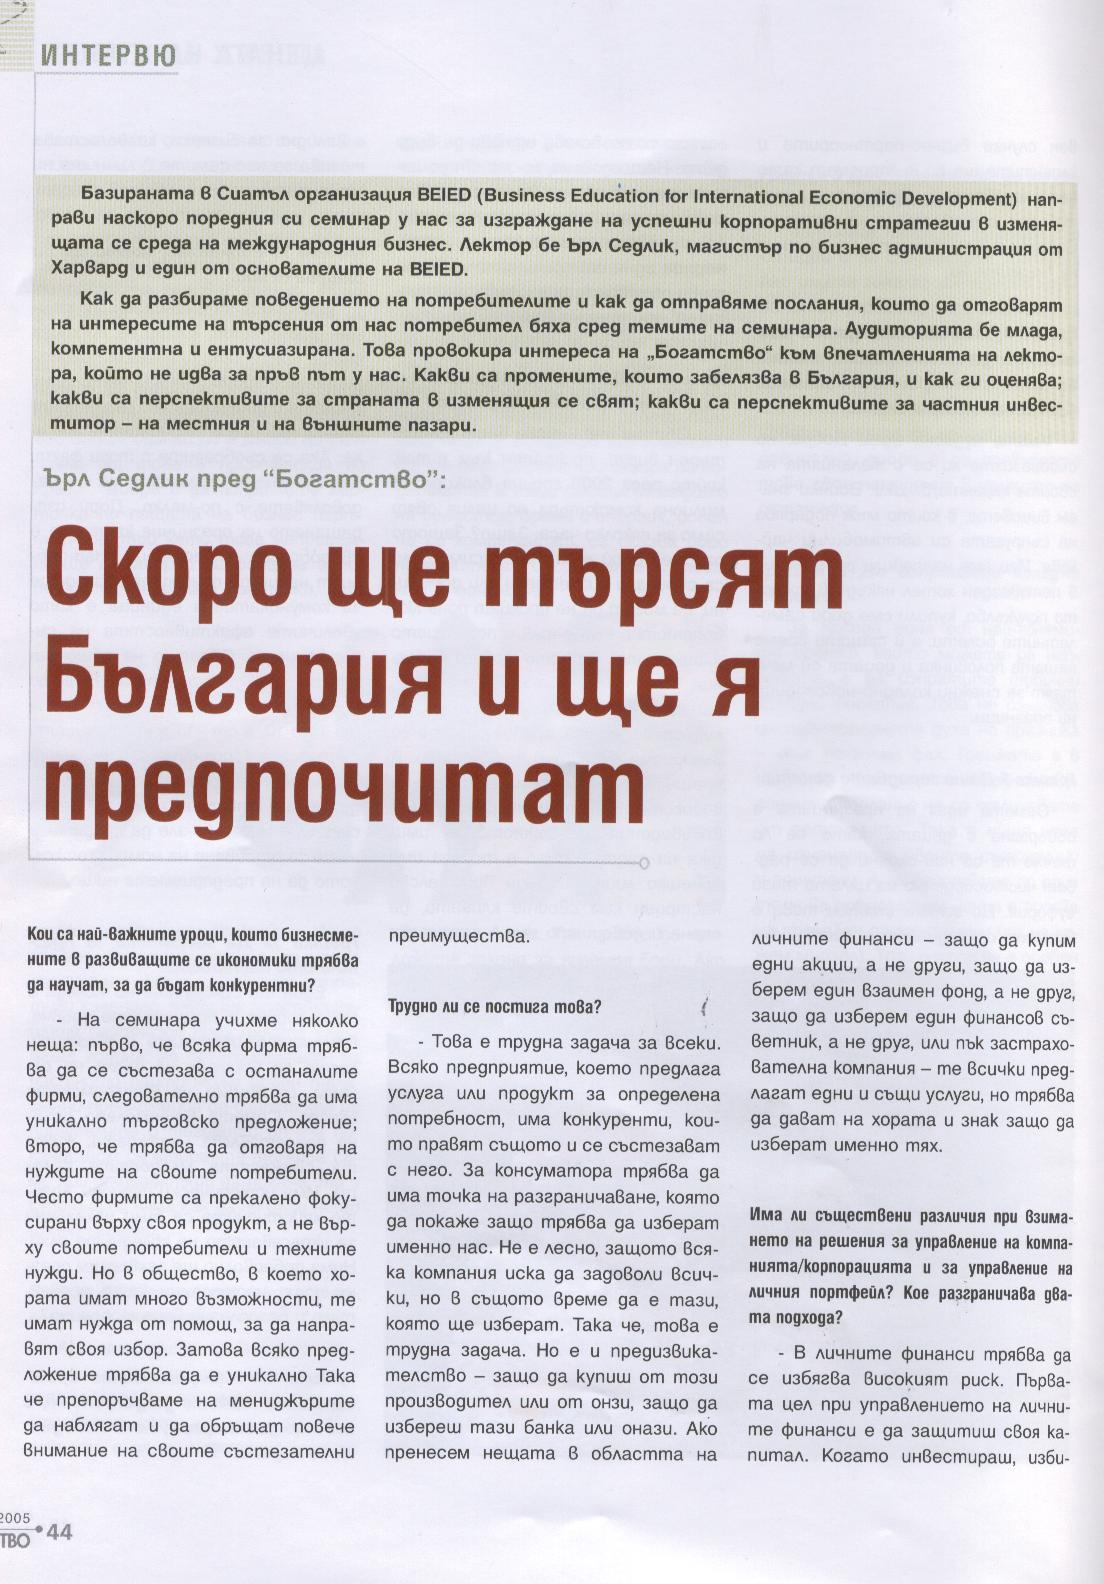 Earl Sedlik in Bogatstvo Magazine